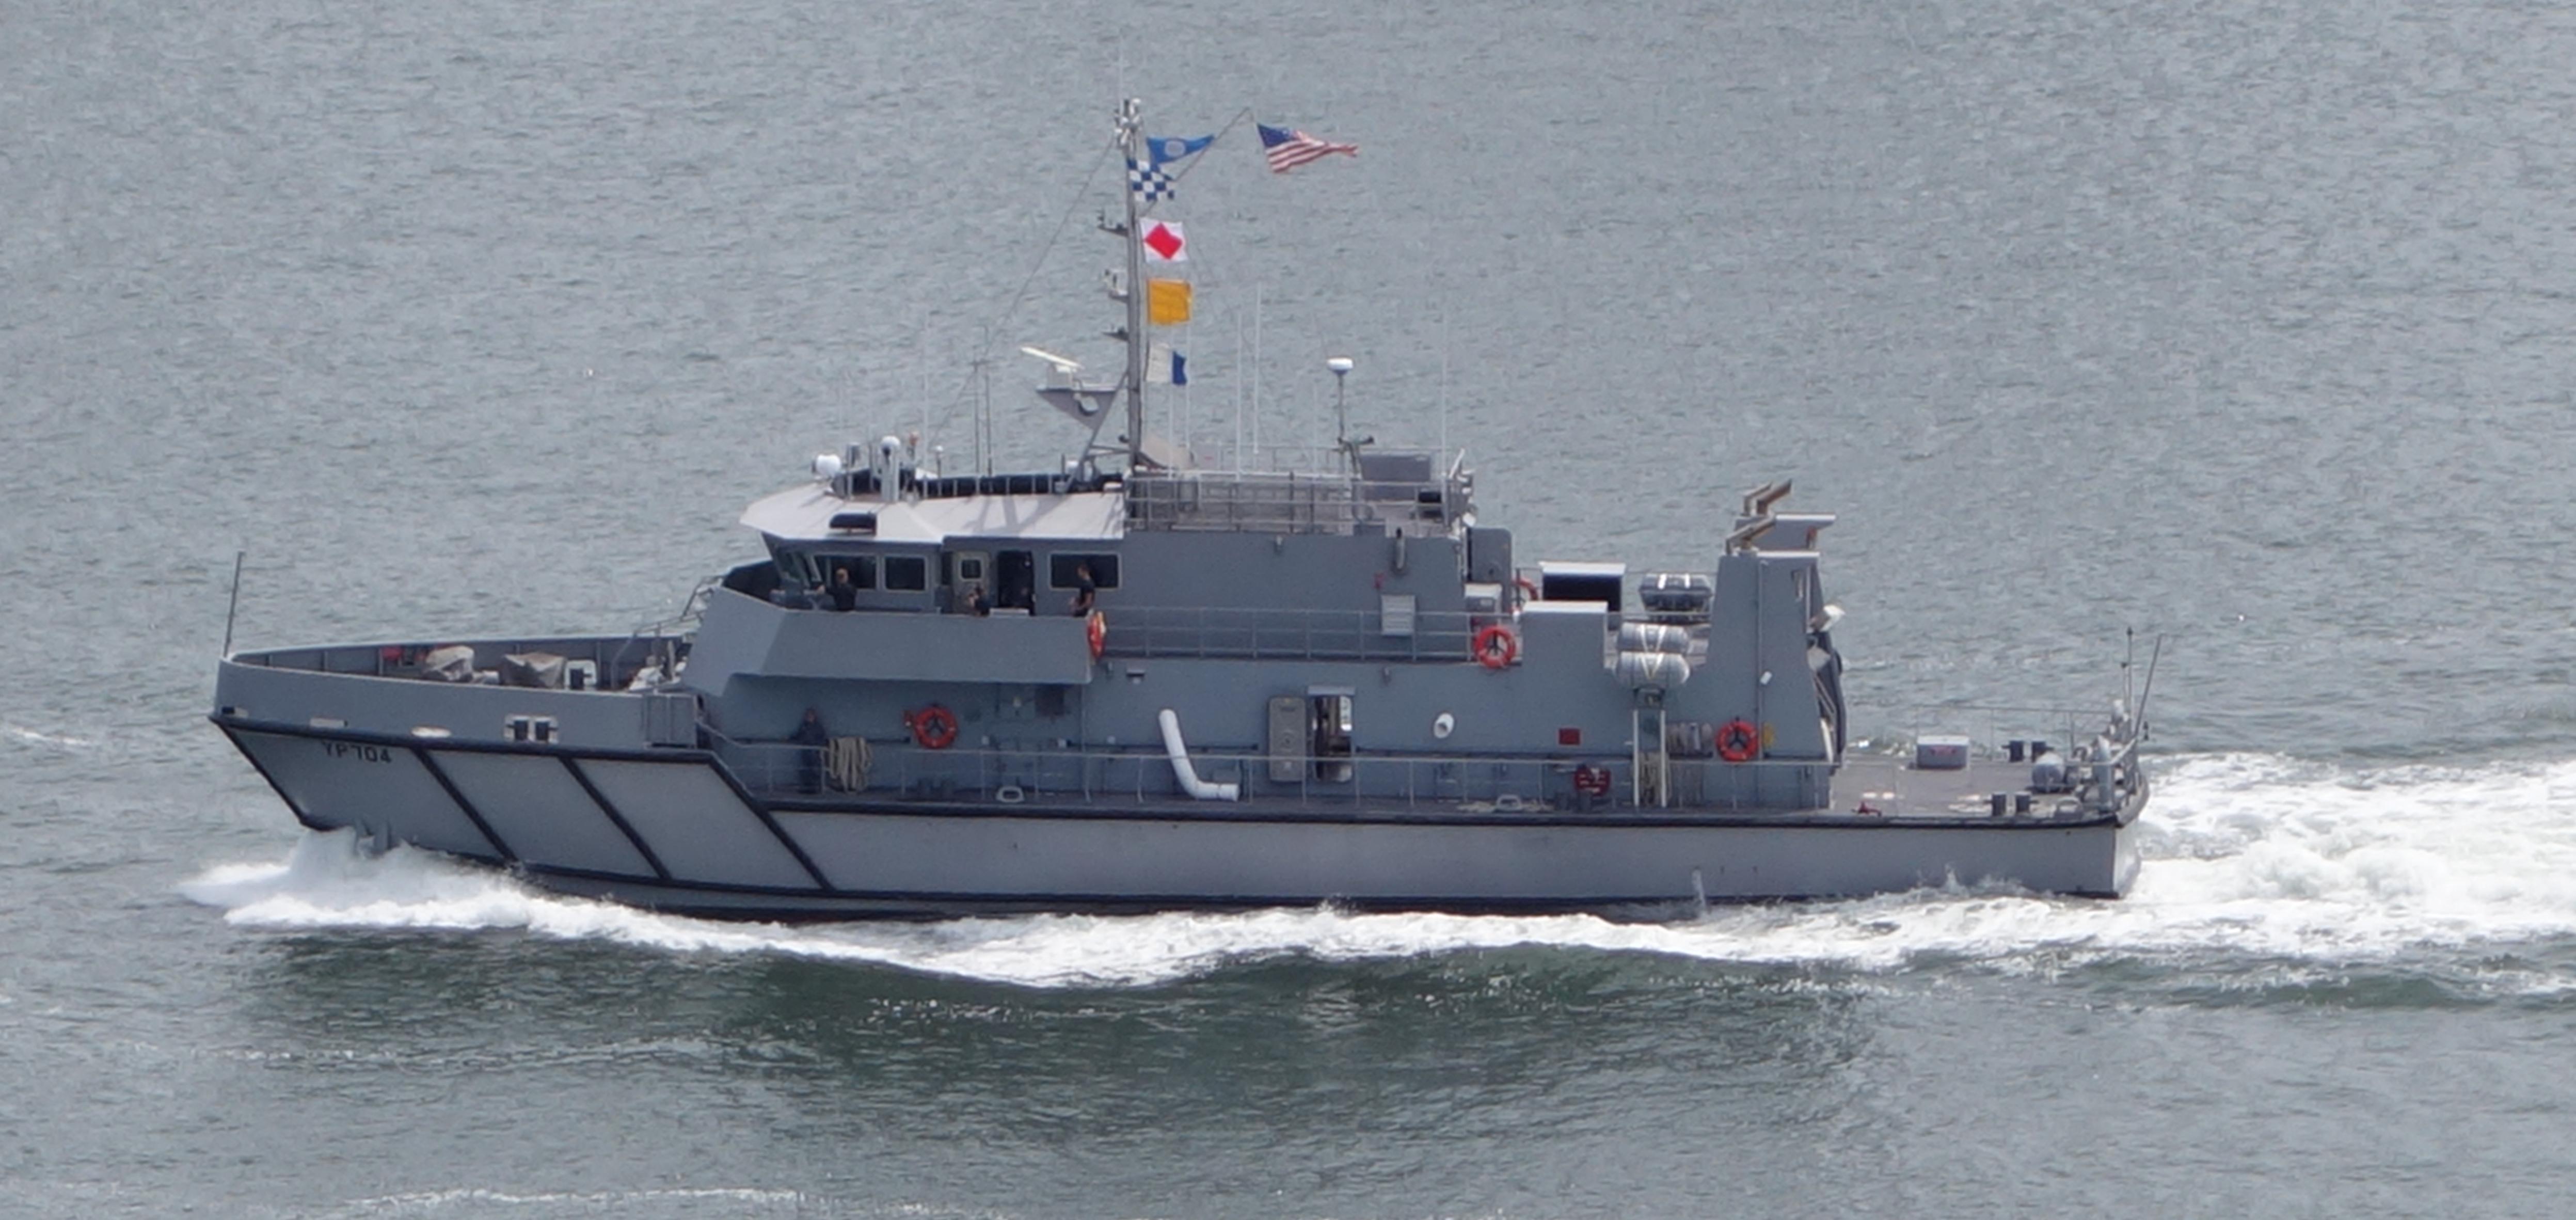 File:US Navy Yard Patrol Boat YP704.jpg - Wikimedia Commons